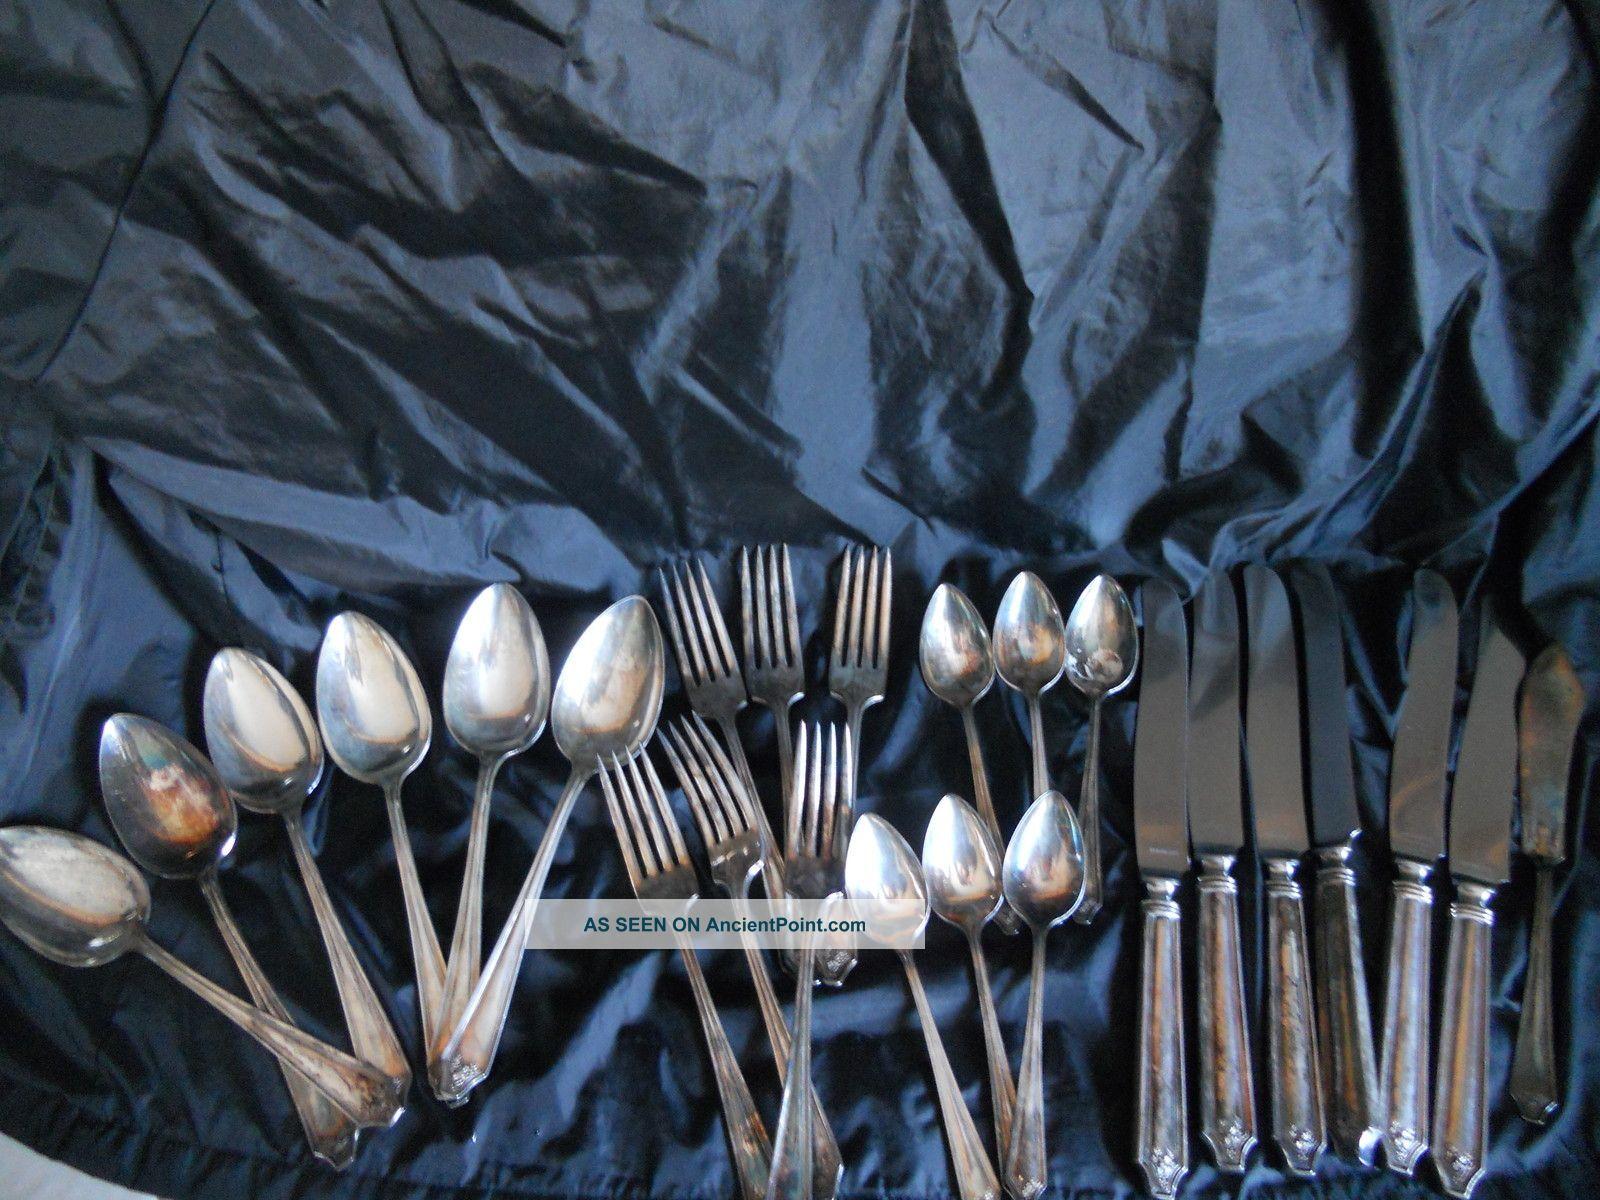 Wm A Rogers 25 - Piece Silverplate Flatware Set Oneida/Wm. A. Rogers photo